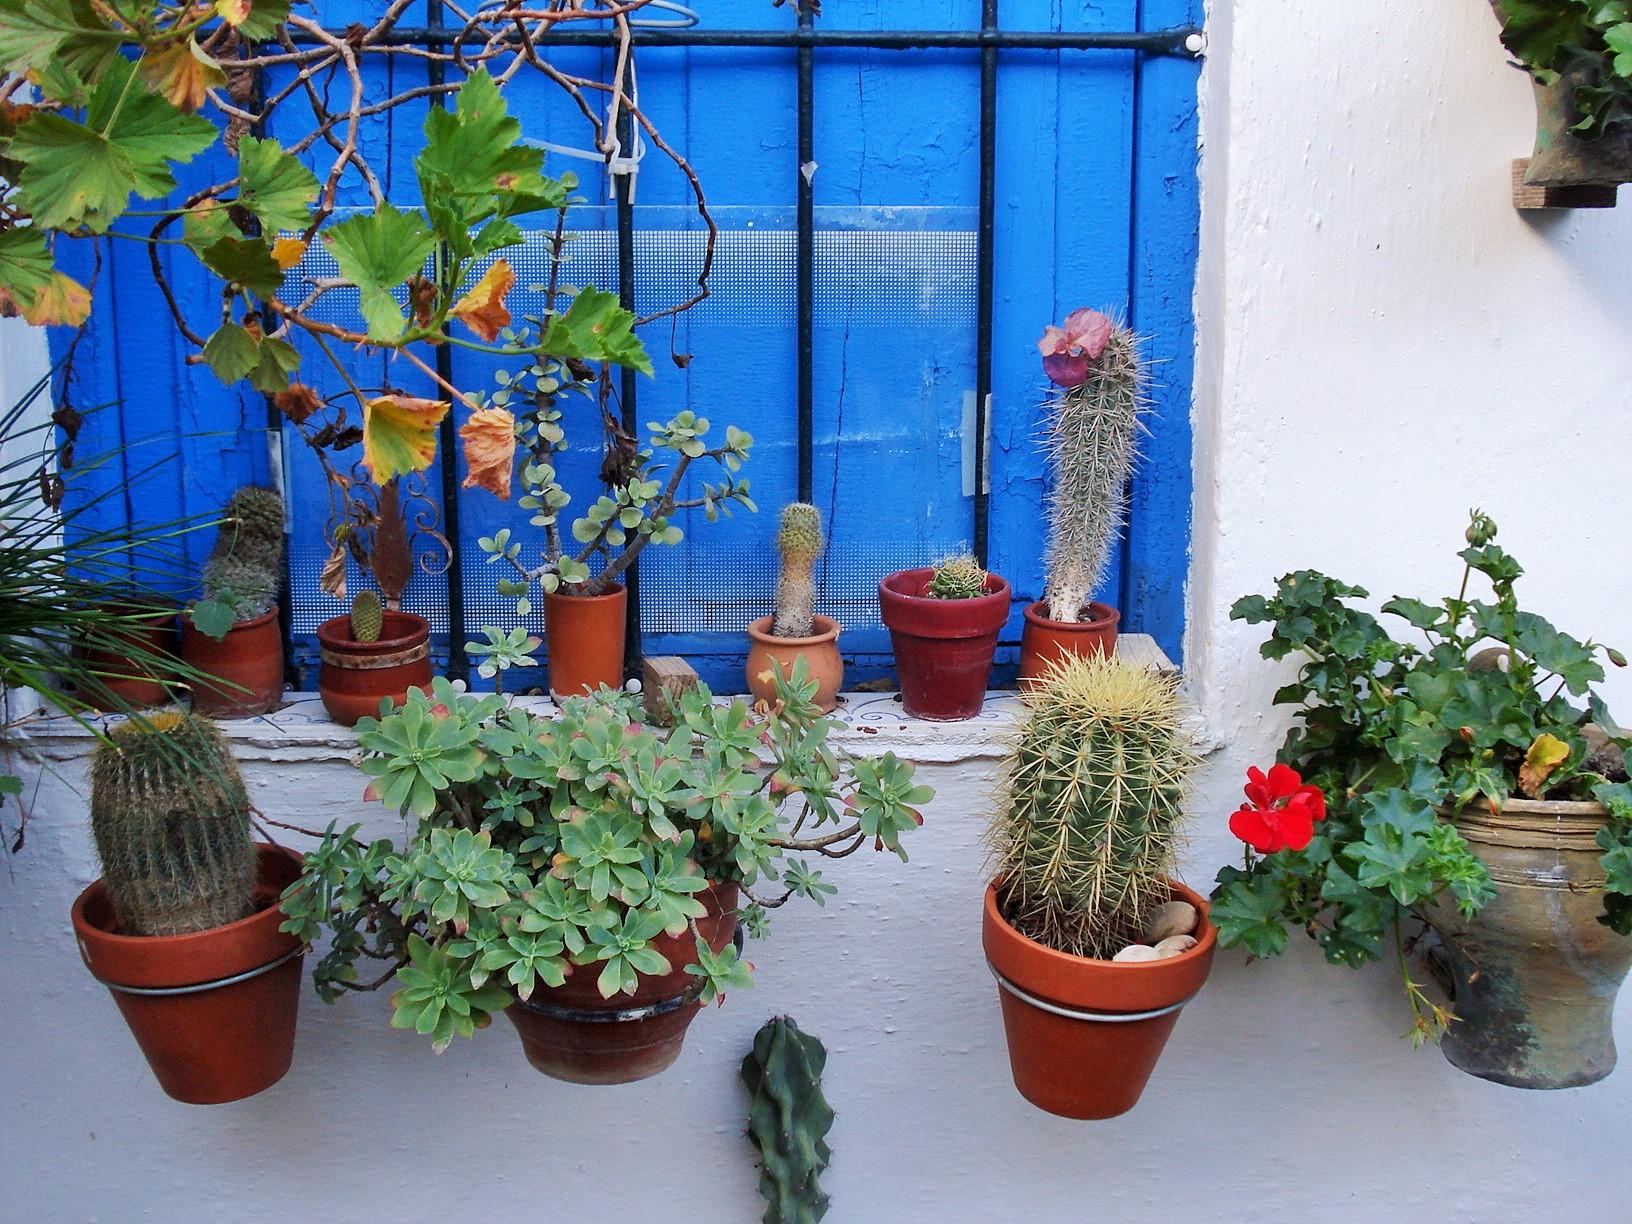 Container Garden Ideas: Casa Del Patio In Cordoba: Vertical & Container Gardening